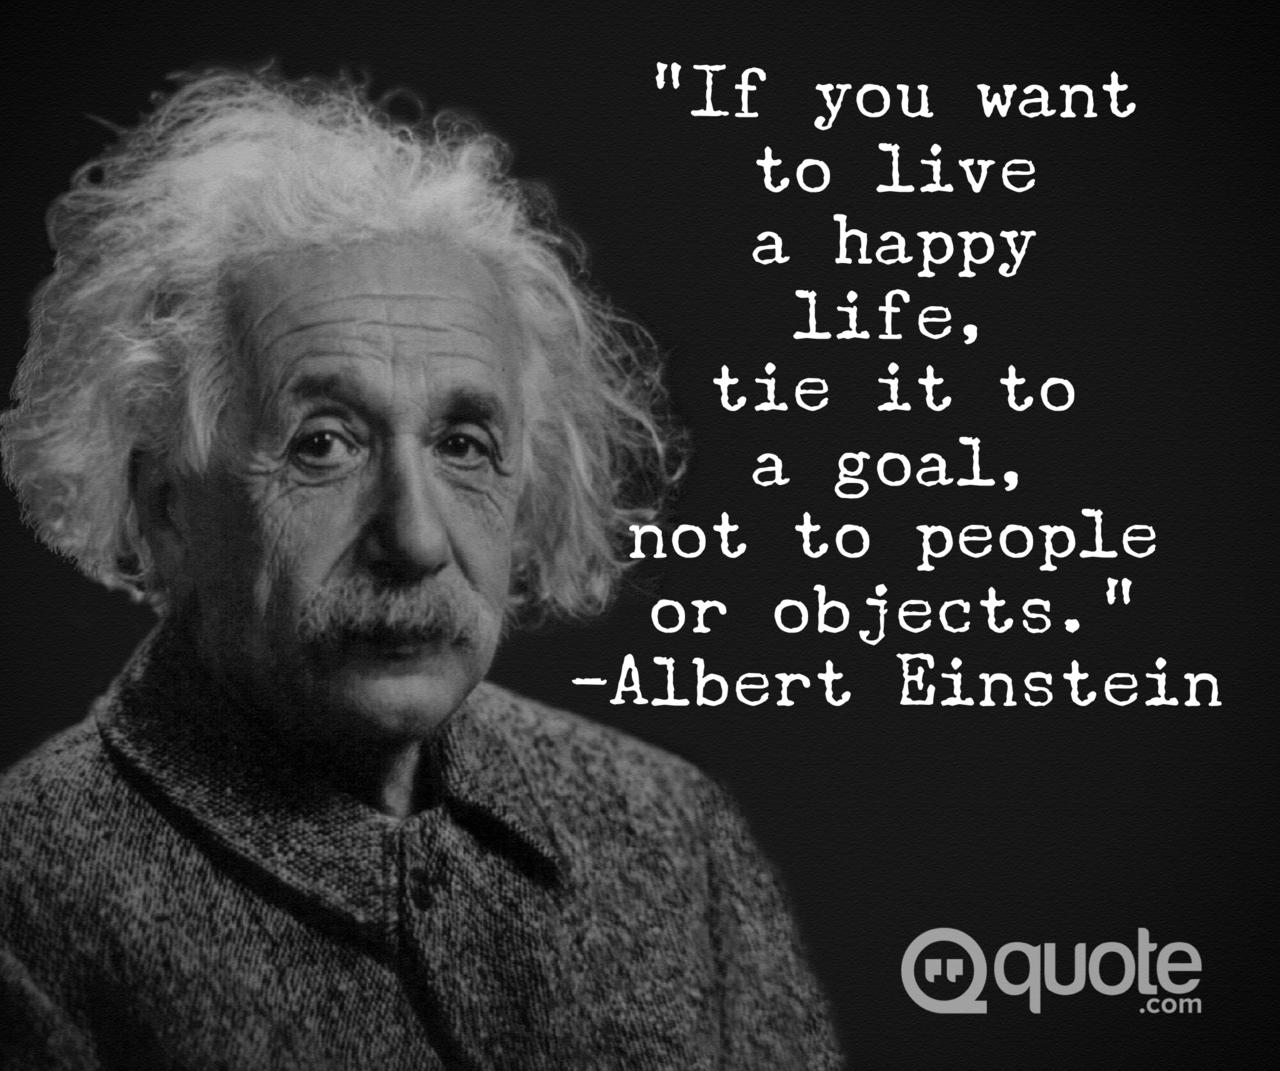 Celebrating Albert Einstein 's Birthday and Pi Day? Have